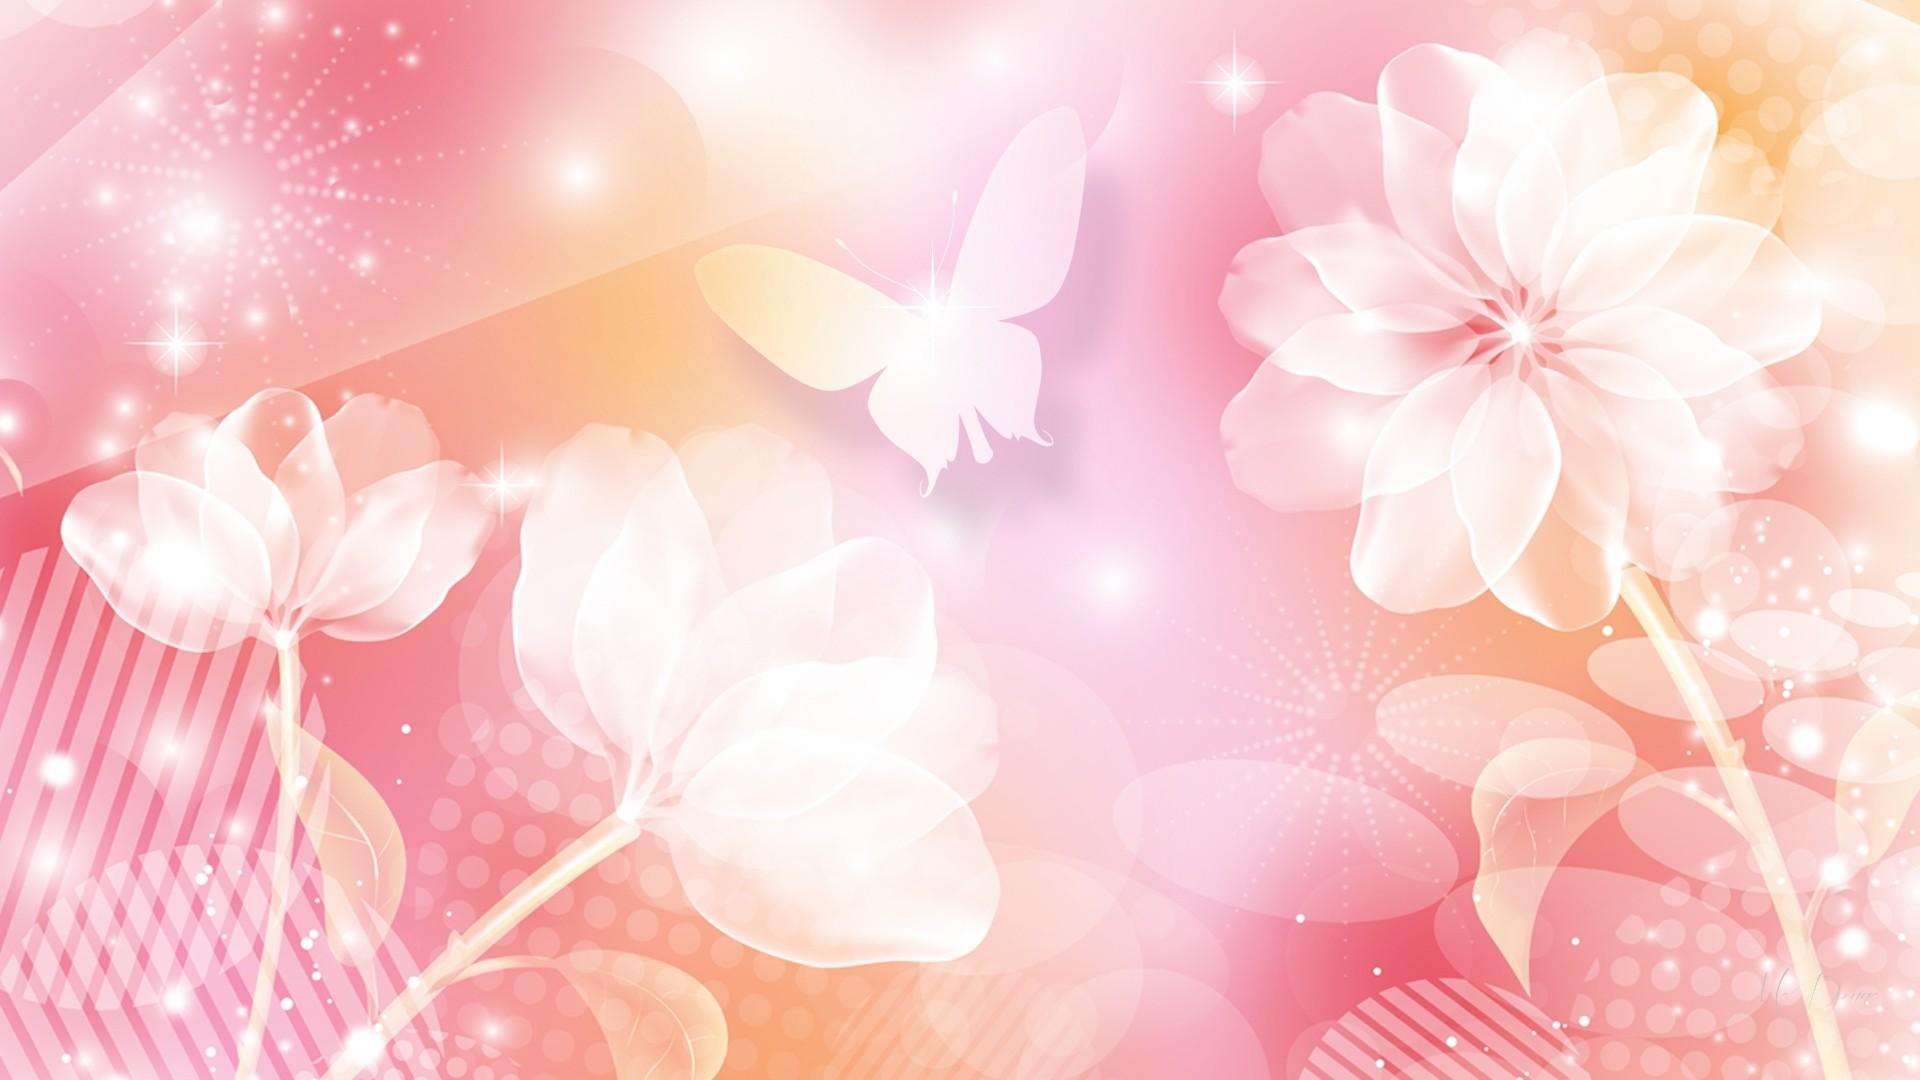 Wallpaper Paris Pink Cute Feminine Wallpapers Hd Pixelstalk Net